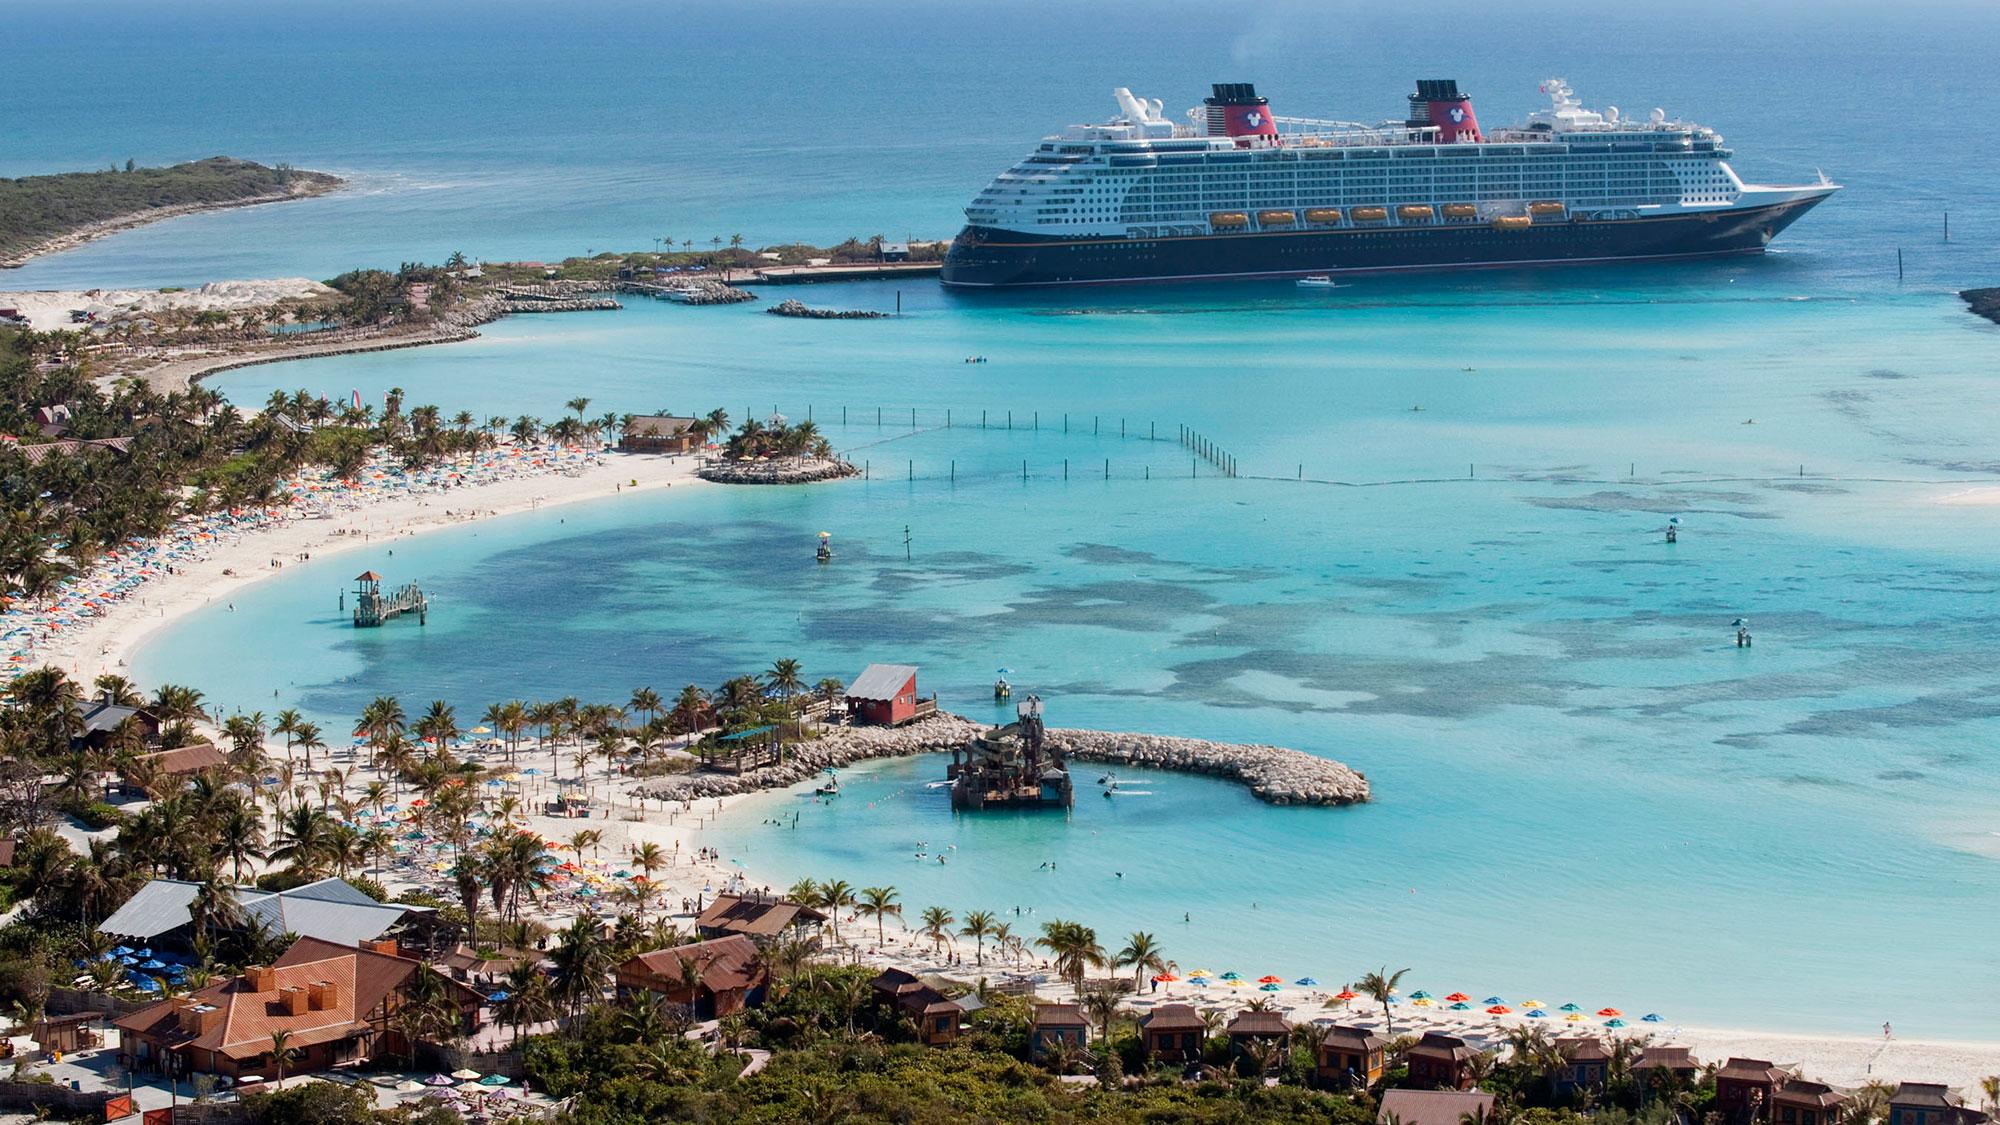 The Disney Dream at Castaway Cay.